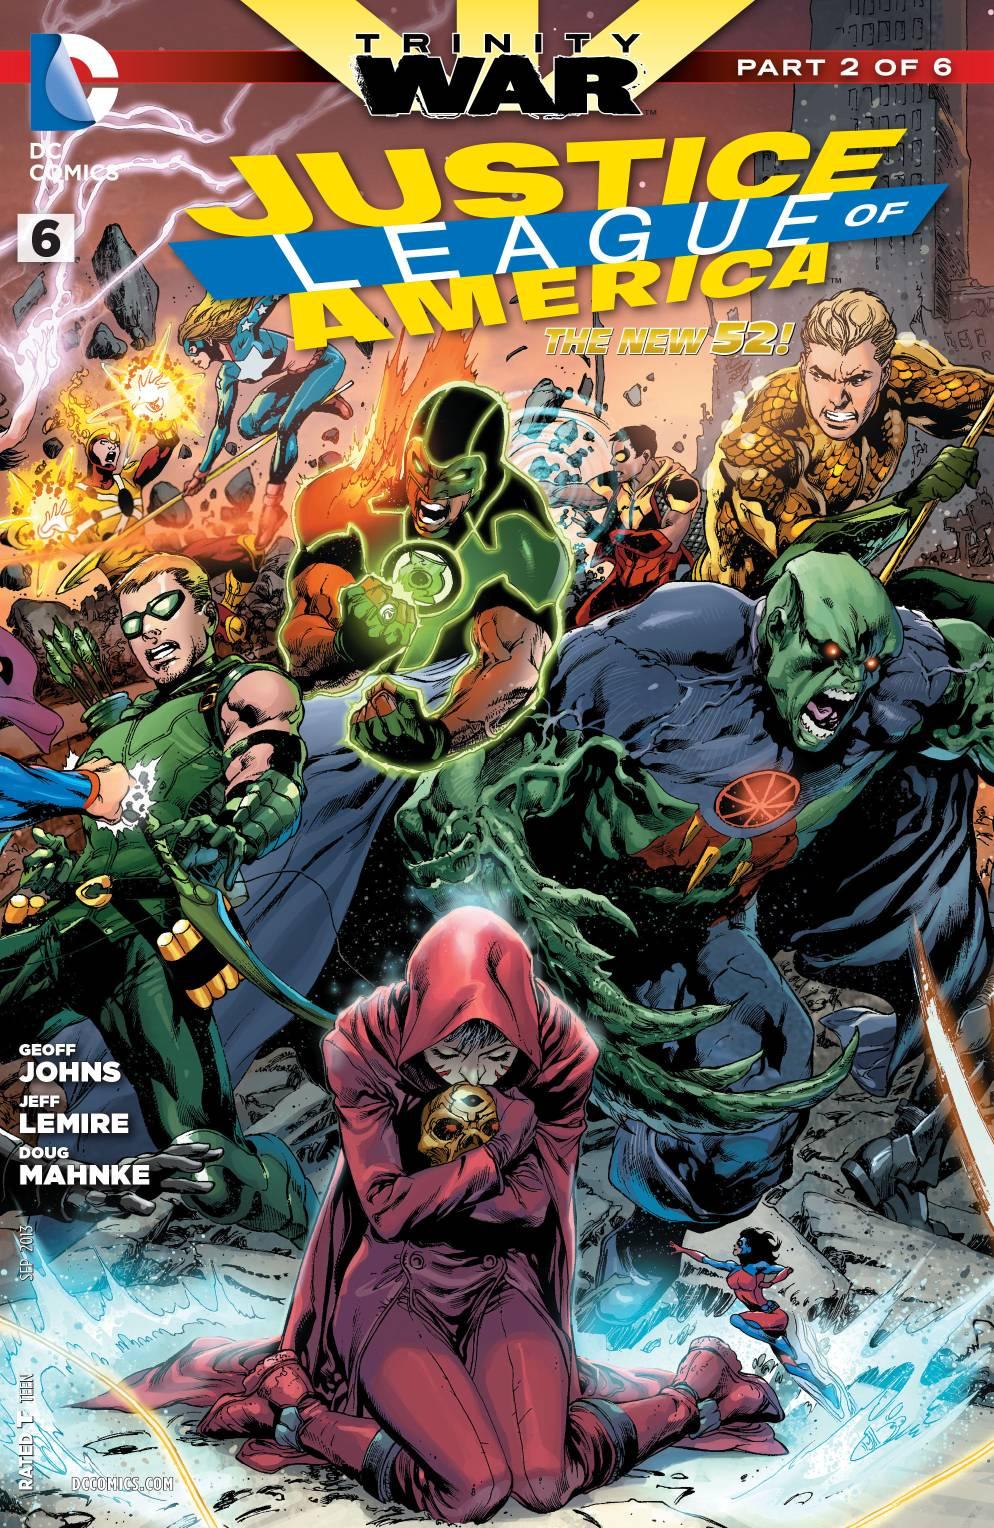 Justice League of America 6